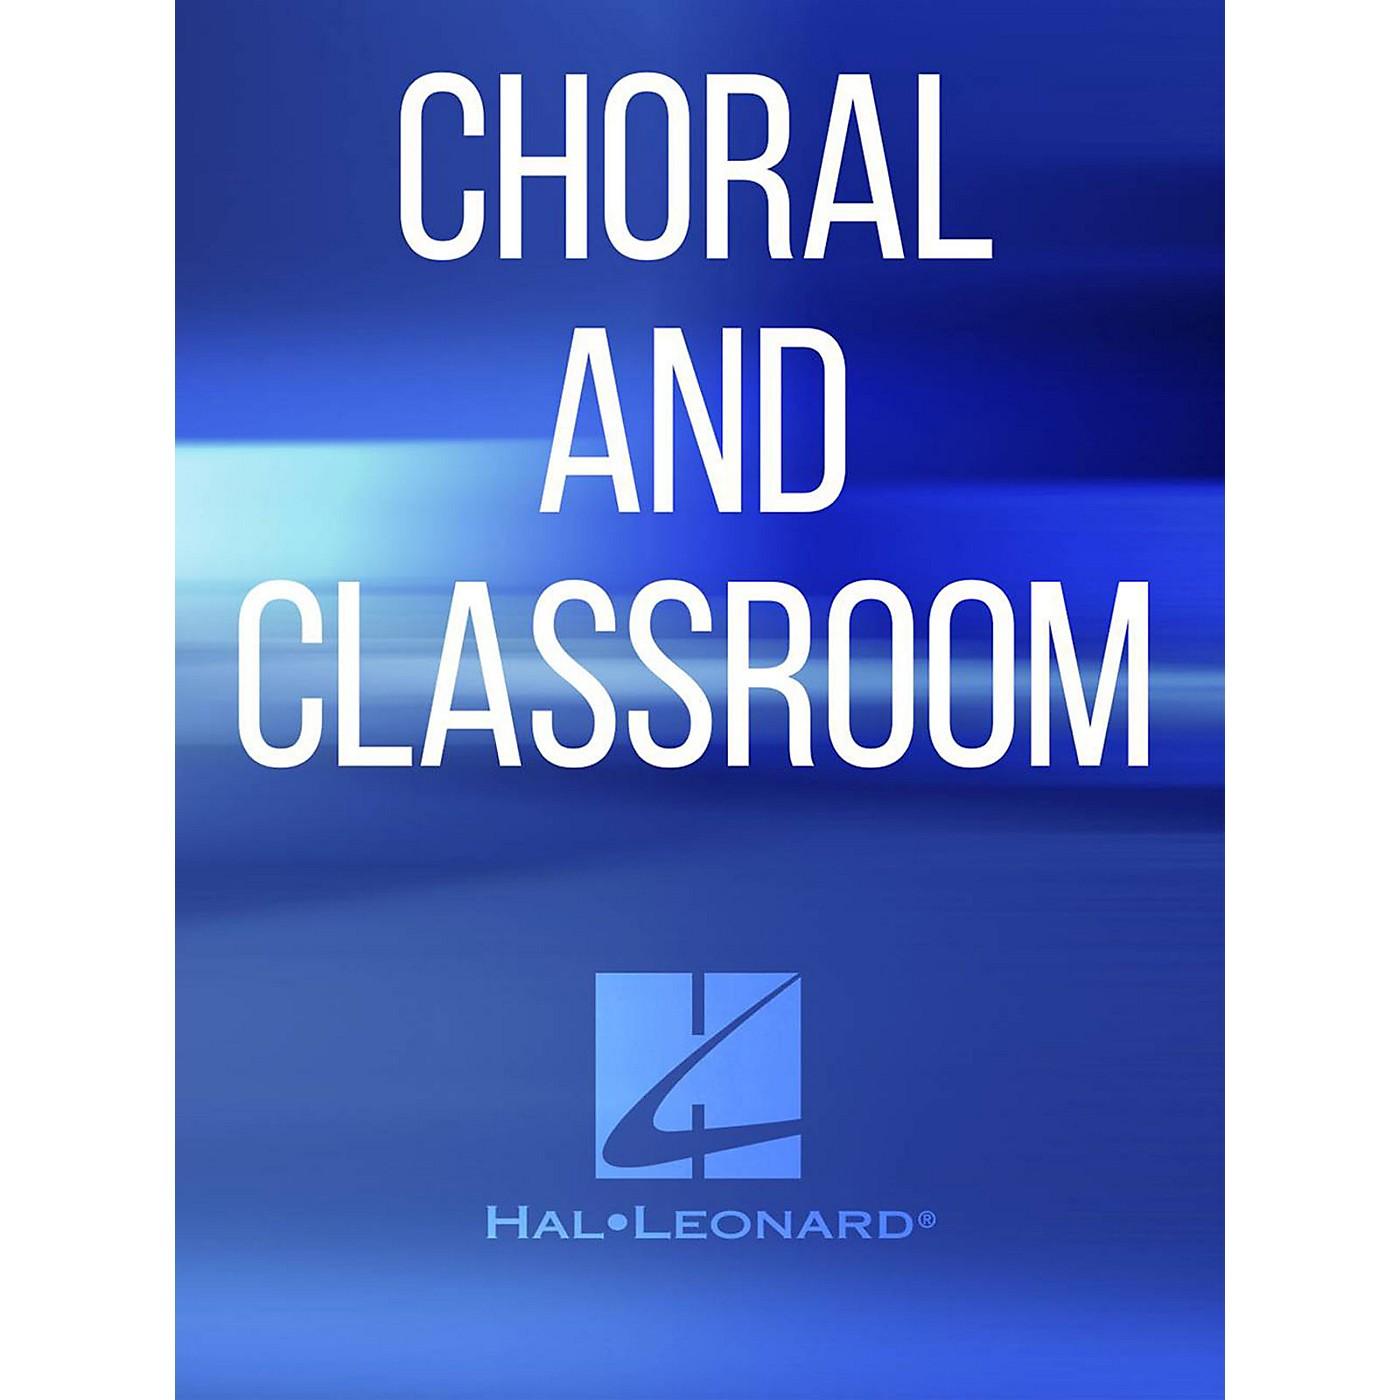 Hal Leonard Ja-Da ShowTrax CD Arranged by Paris Rutherford thumbnail